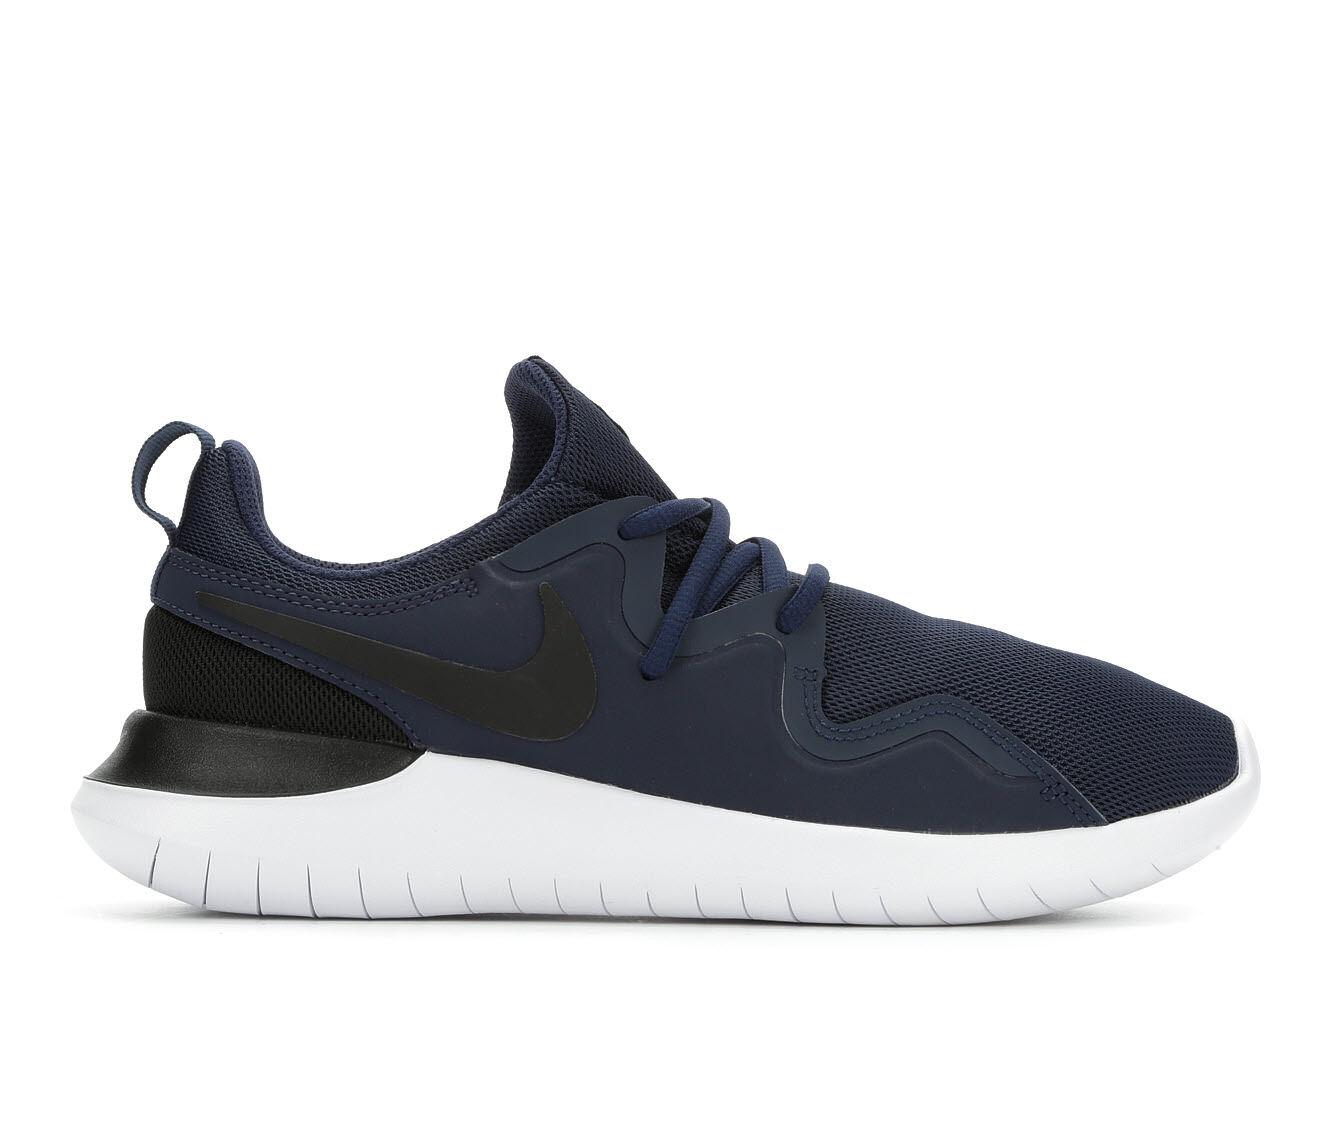 Men's Nike Tessen Sneakers Navy/Black/Whit